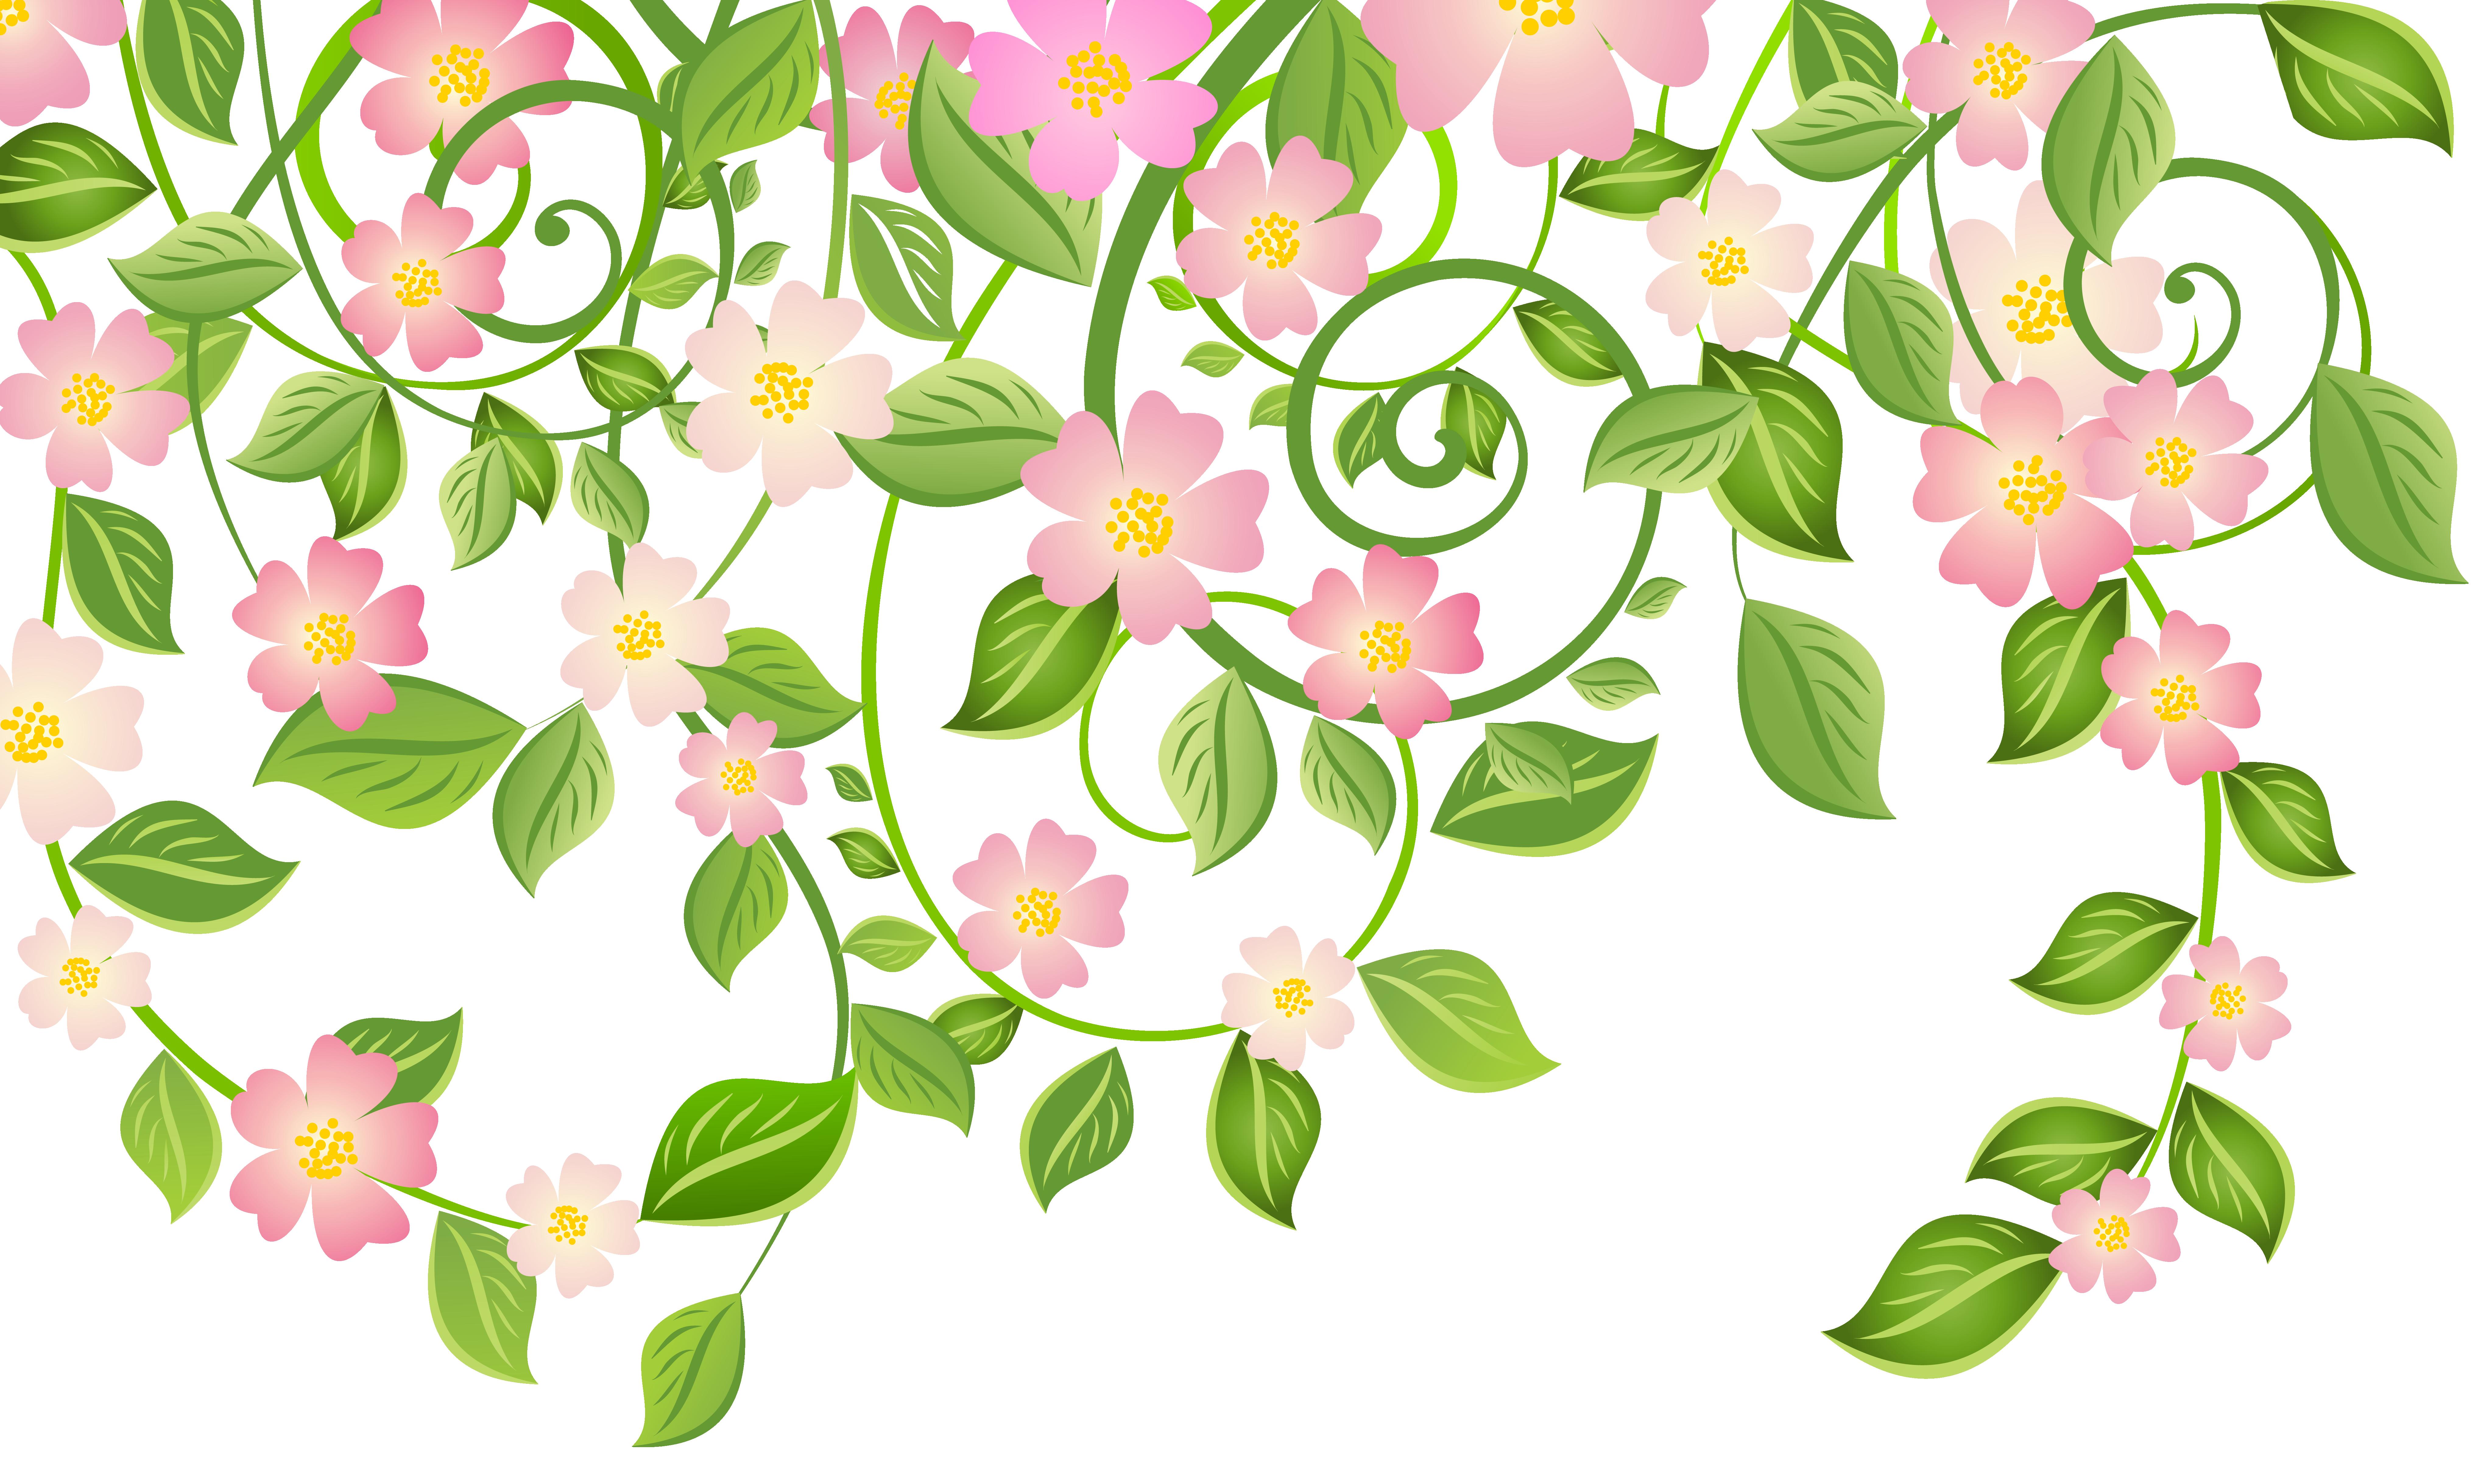 Raindrop clipart spring. Flower garden clip art